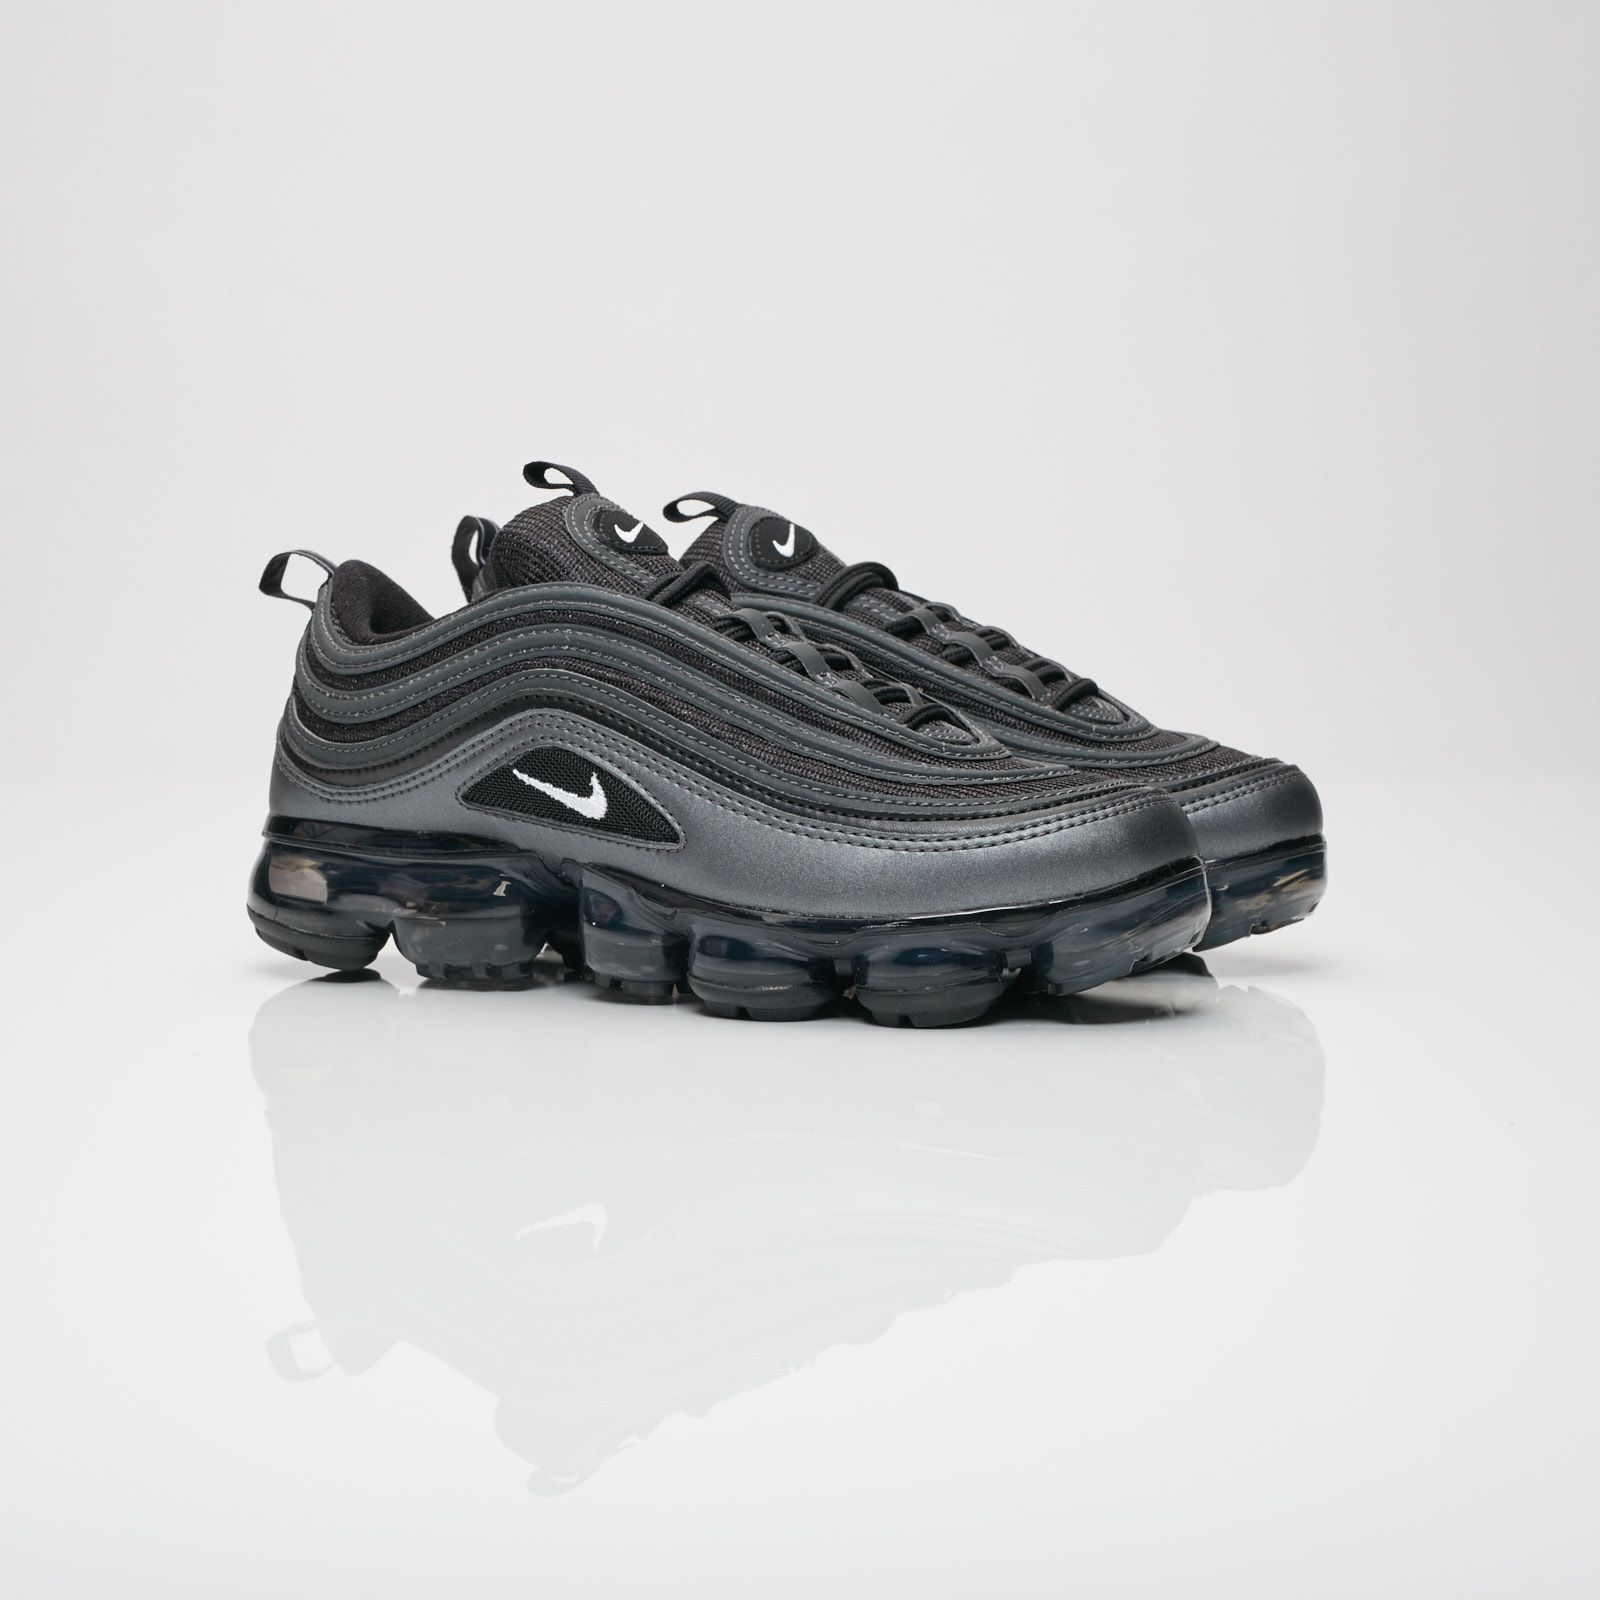 Nike W Air Vapormax 97 - Ao4542-001 - Sneakersnstuff  f700ca3d4